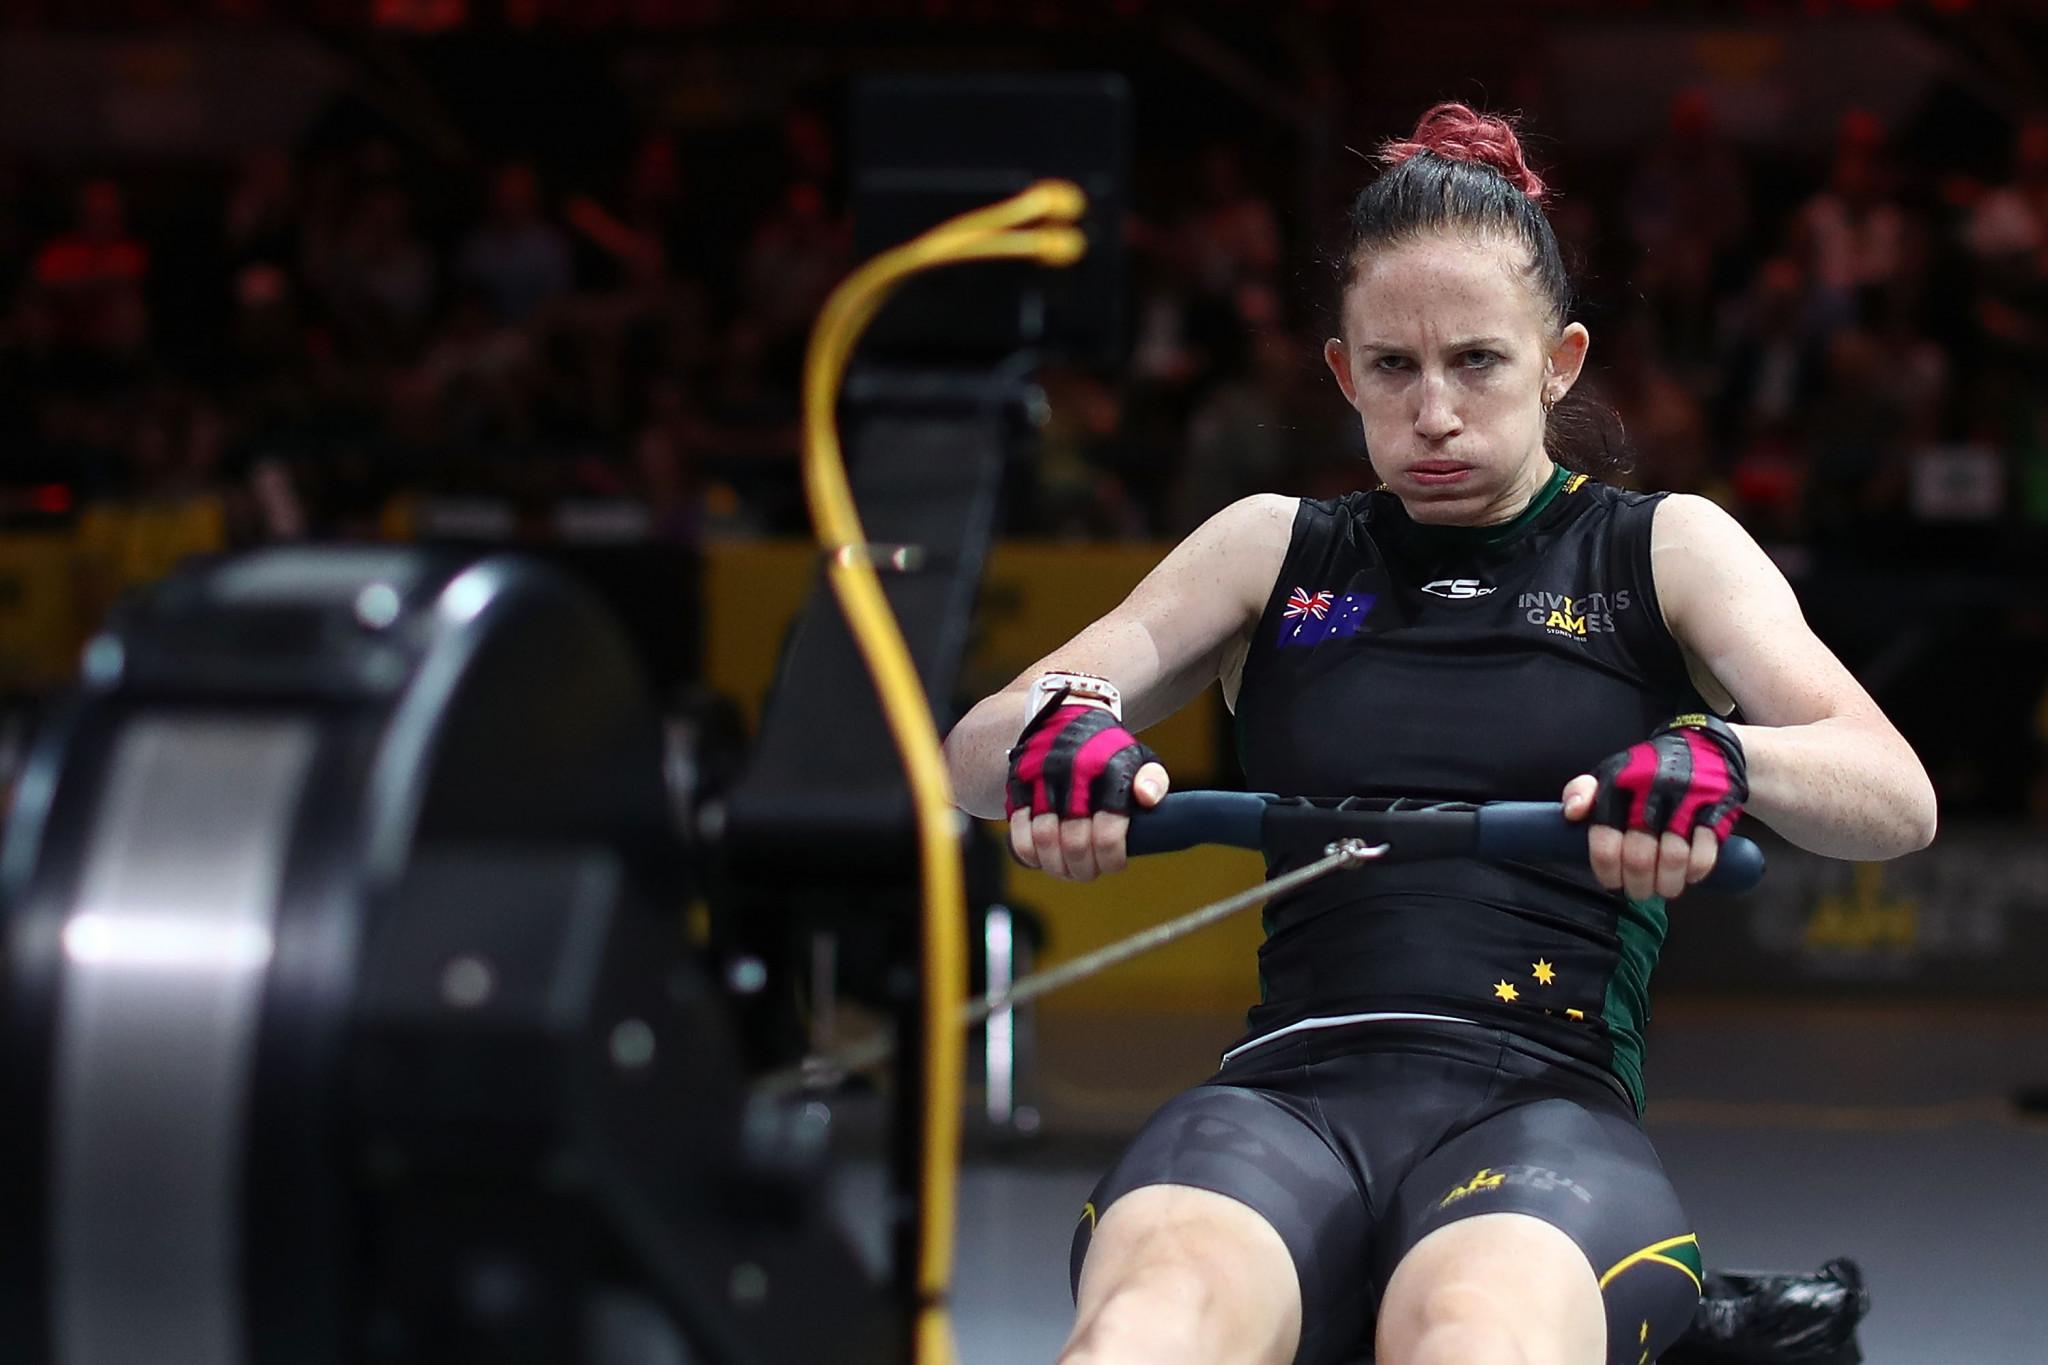 Australia excel at indoor rowing at 2018 Invictus Games